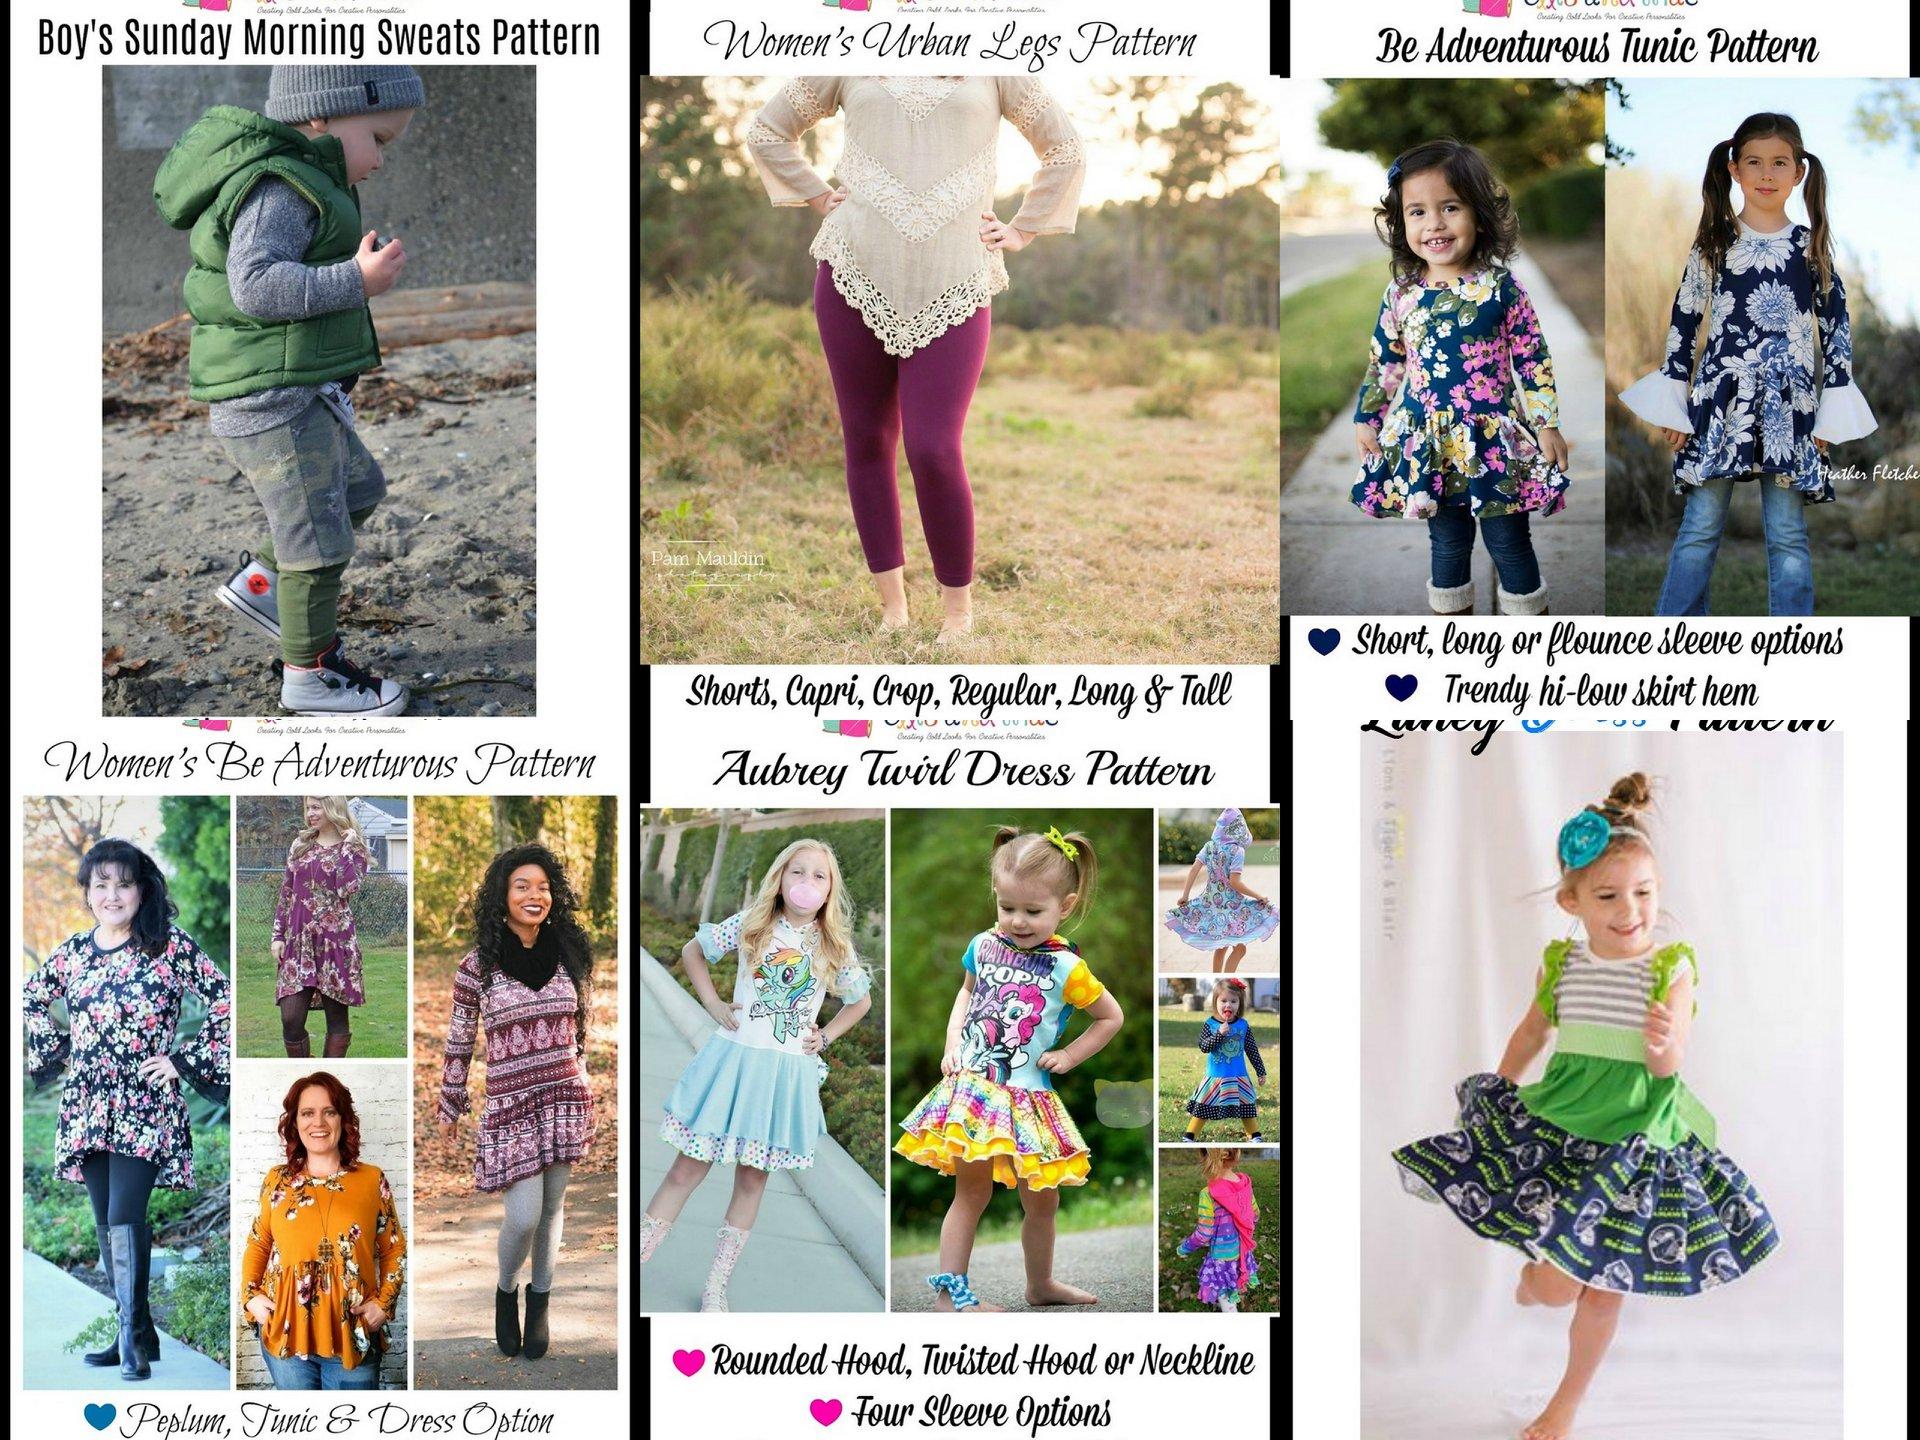 wacky wednesday $1 Sewing Patterns Februrary 6 2018